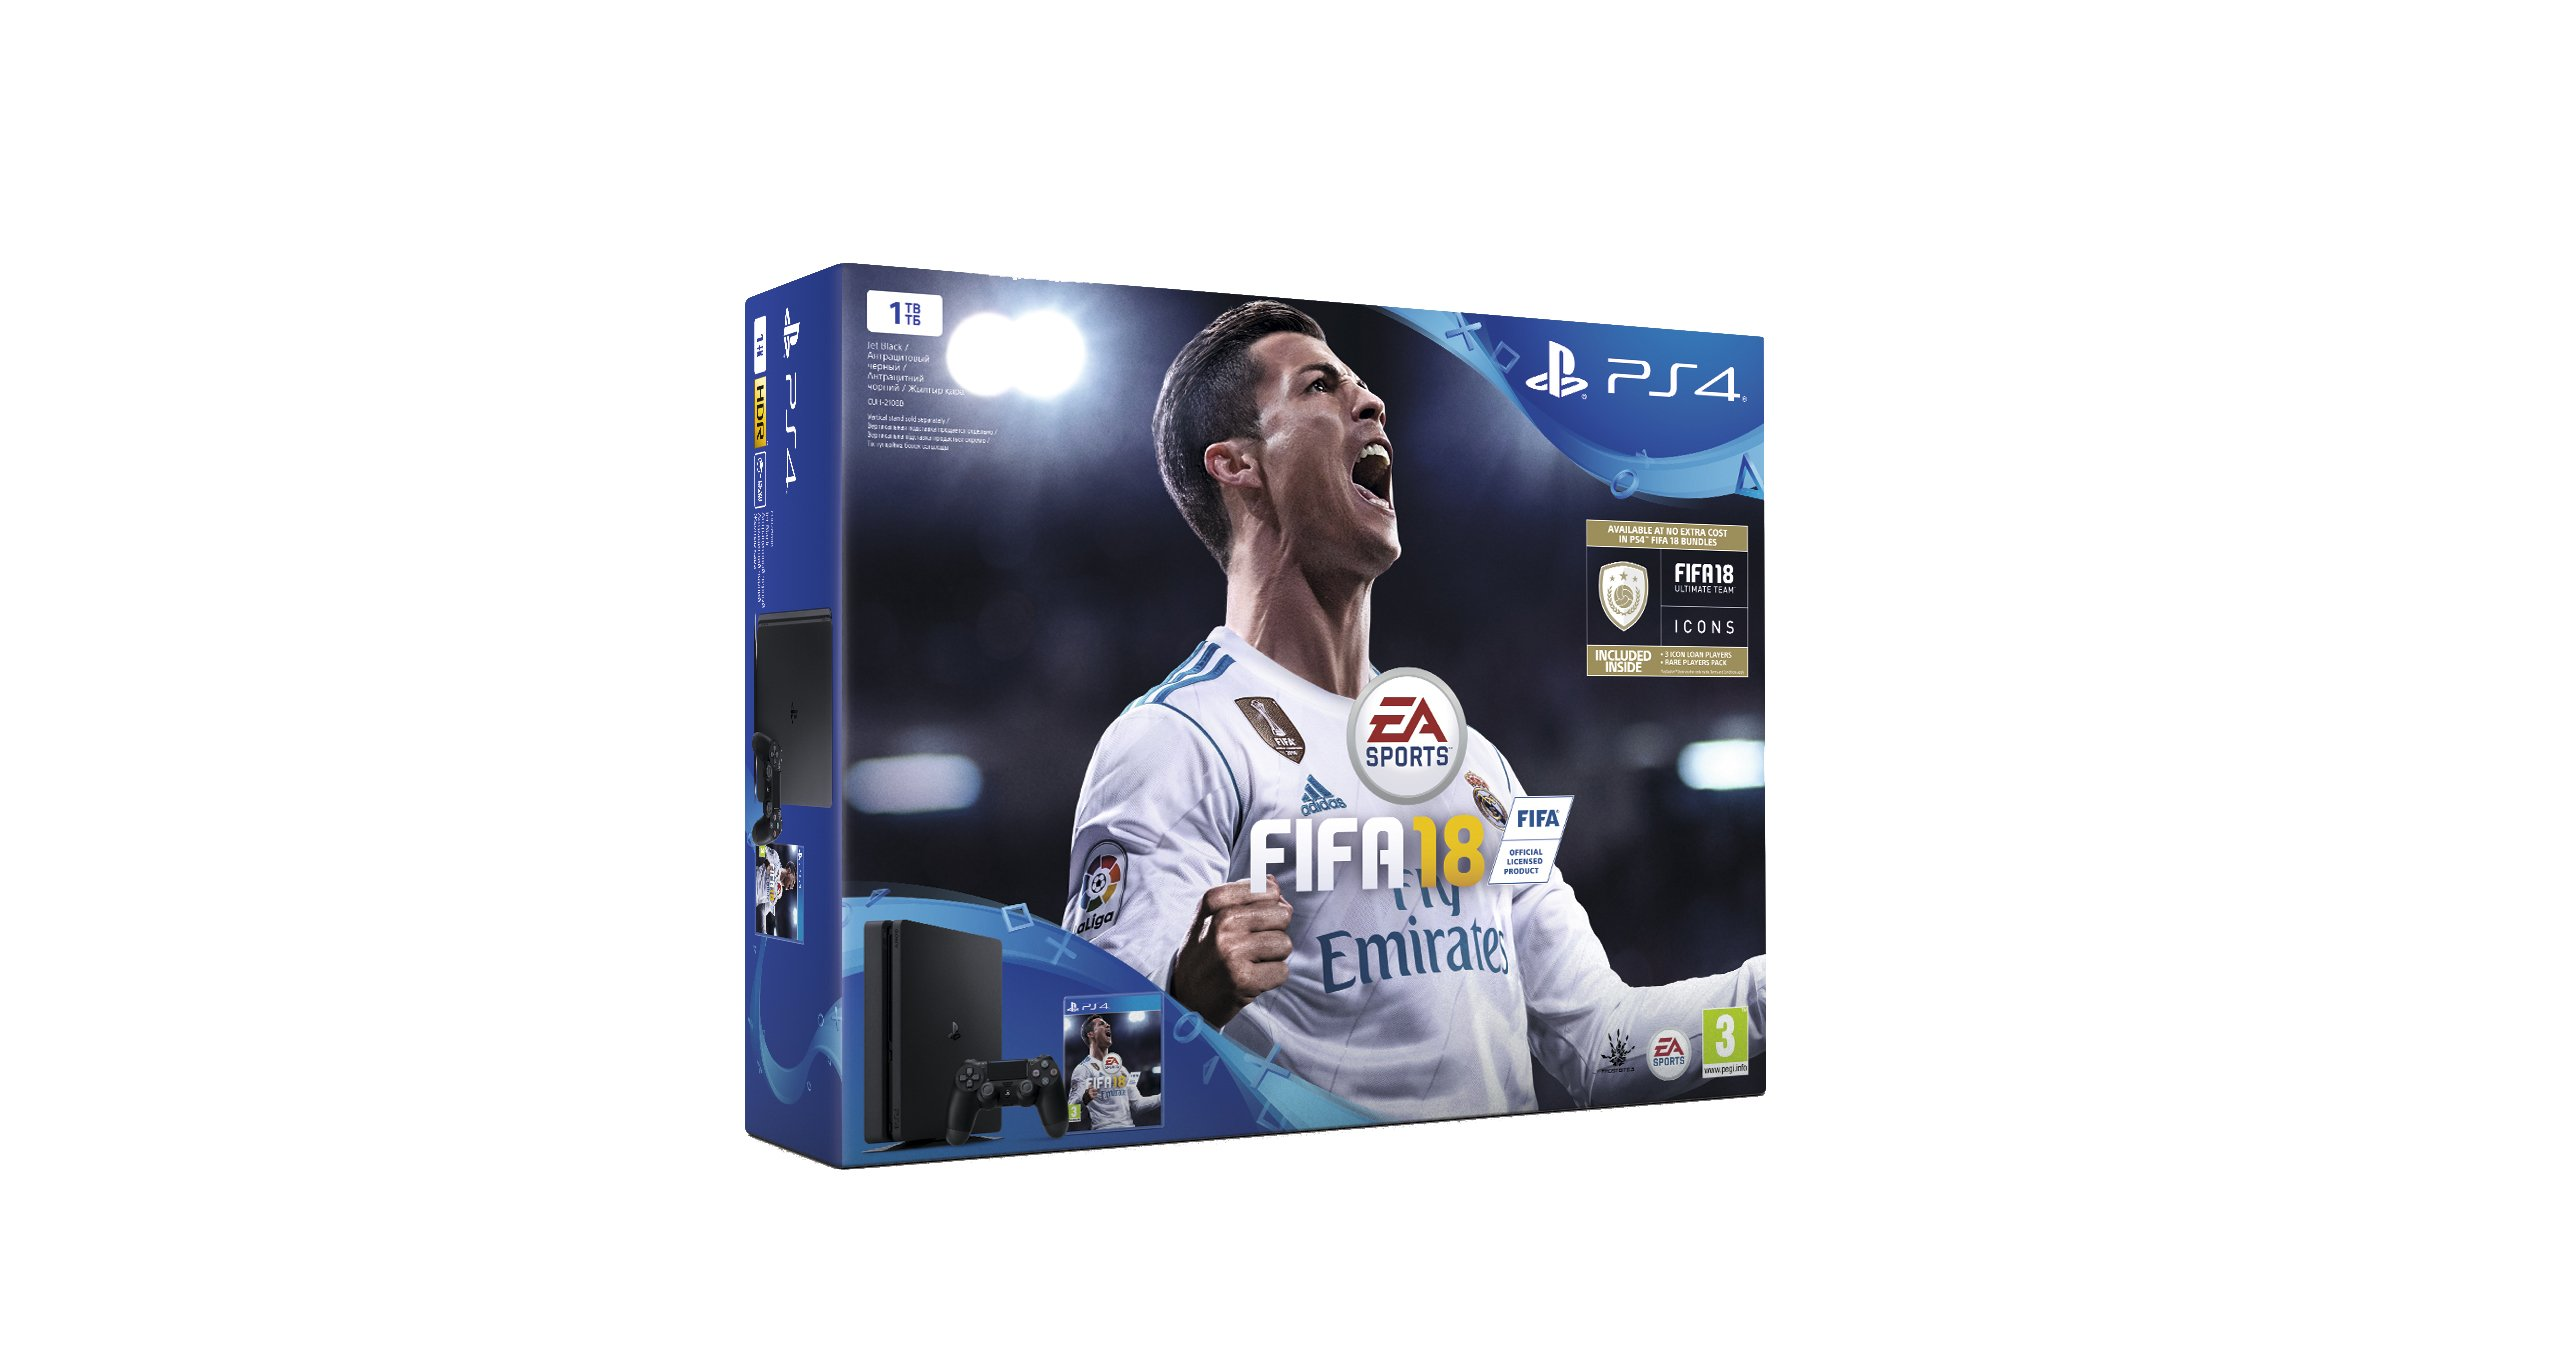 PS4 FIFA 18 bundle